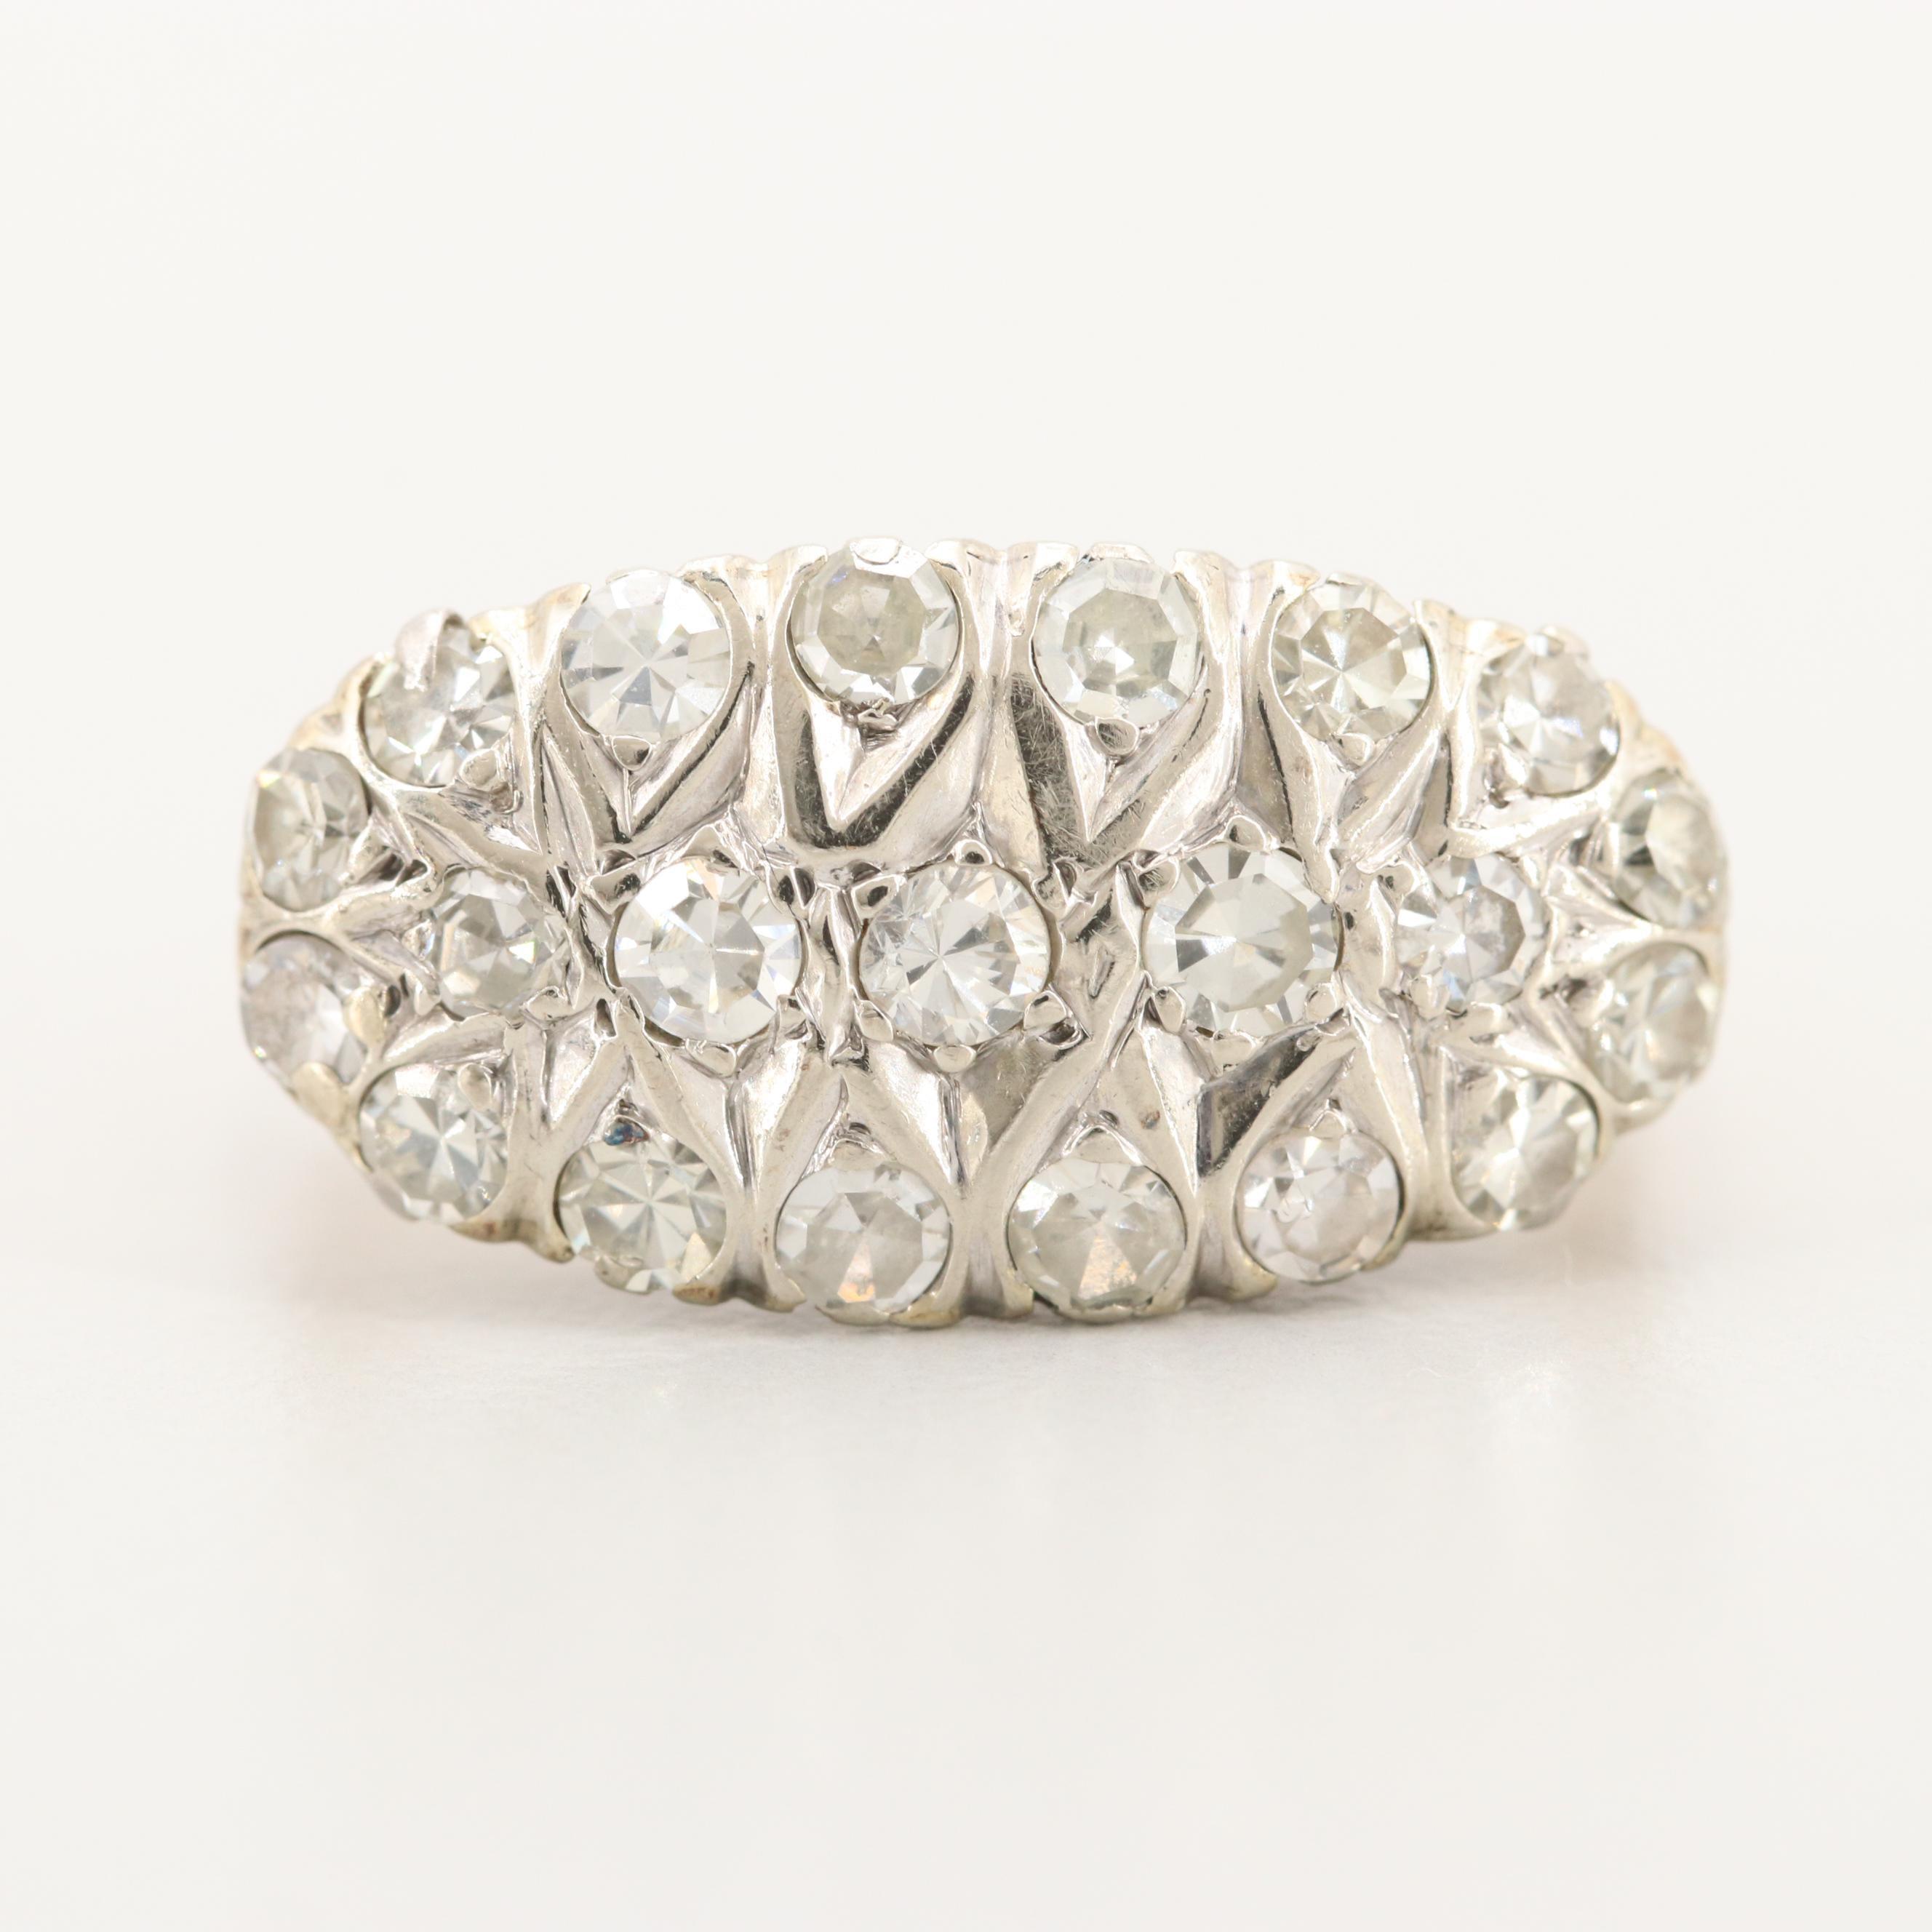 Circa 1930s 14K Yellow and White Gold 1.01 CTW Diamond Ring